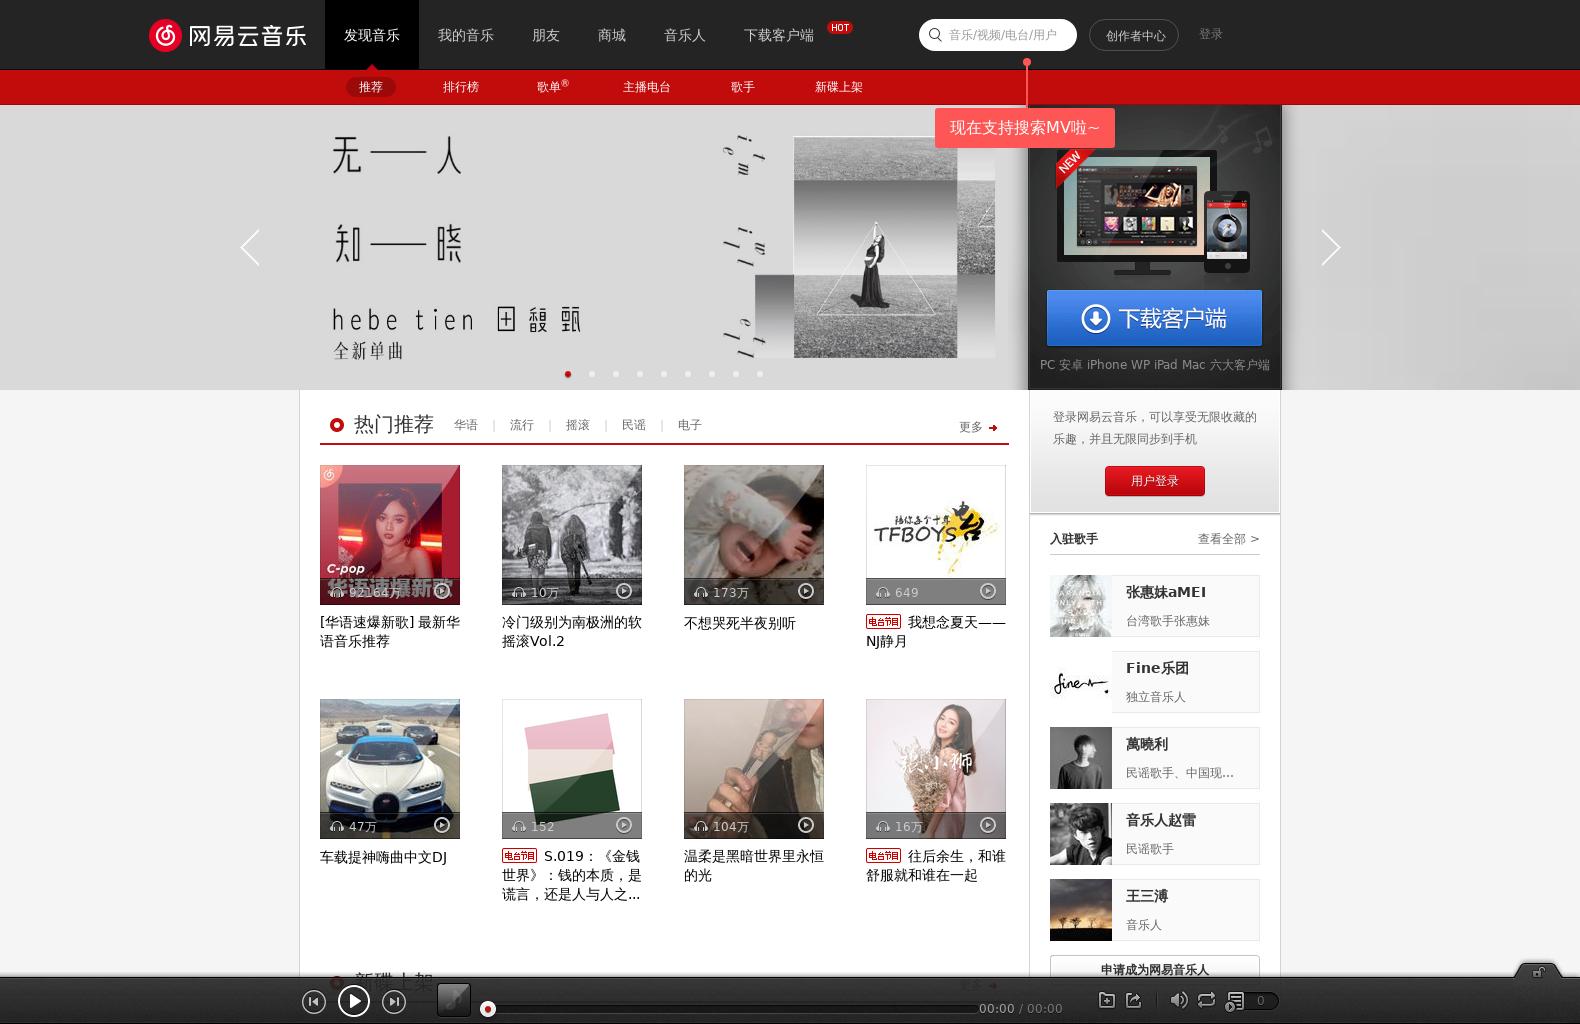 music.163.com网站截图